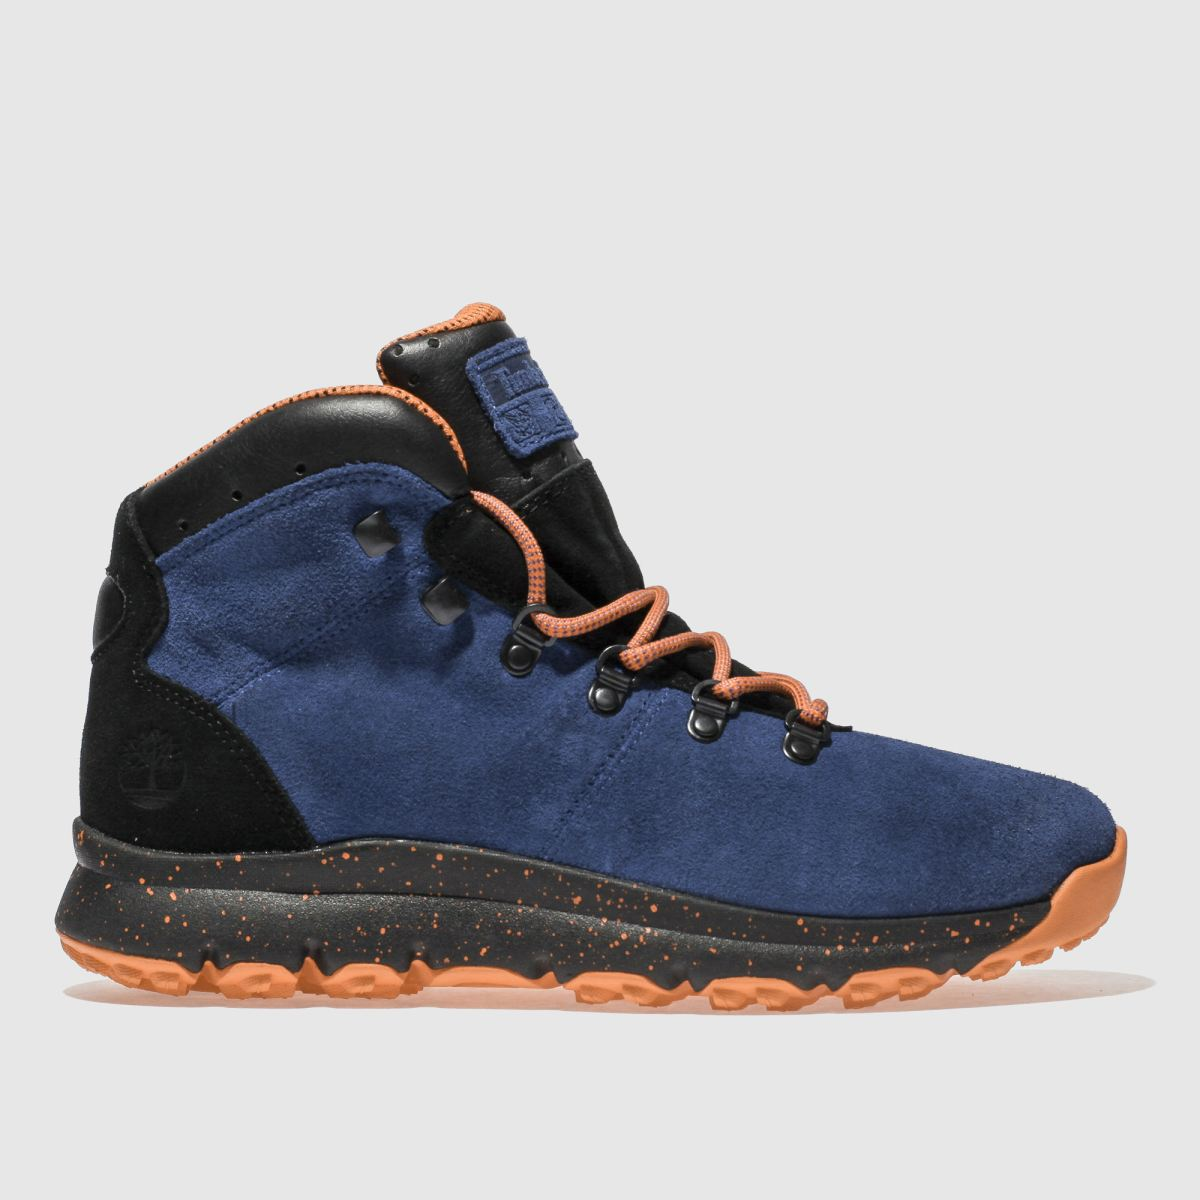 Timberland Blue World Hiker Mid Boots